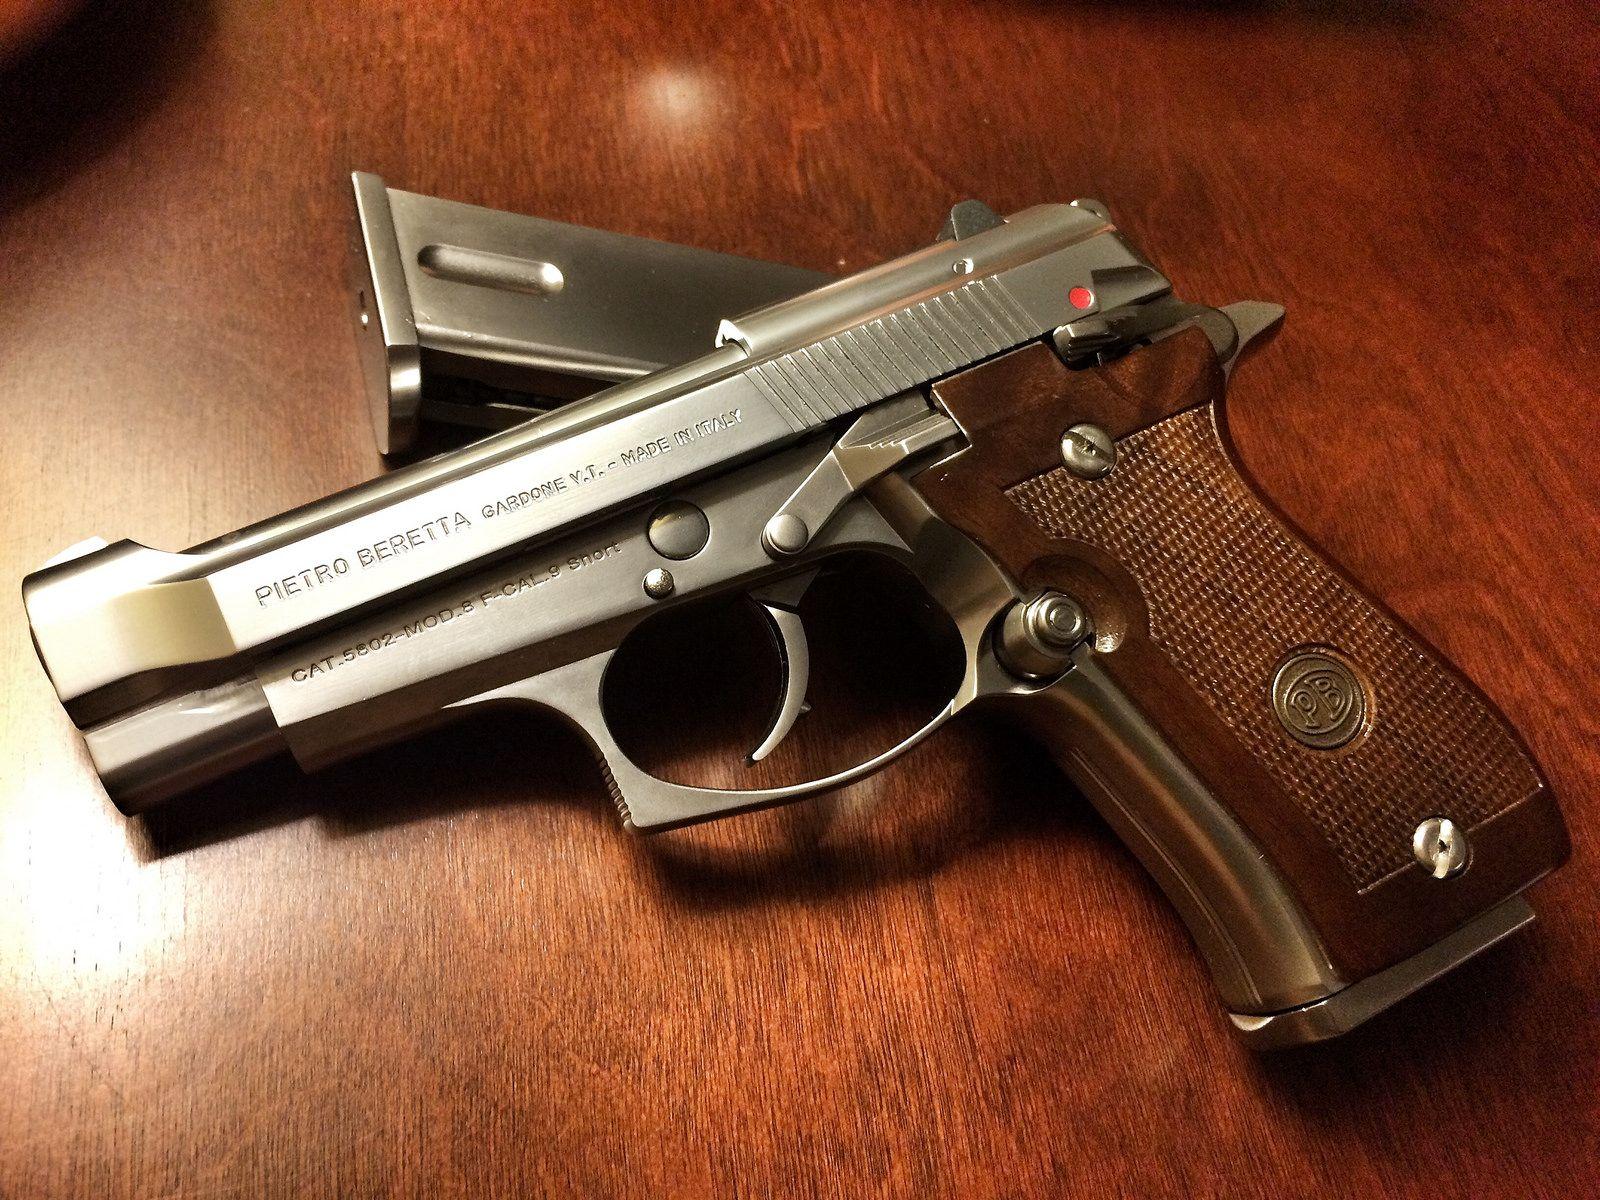 Beretta Cheetah Model 84FS | My little hobby | Beretta